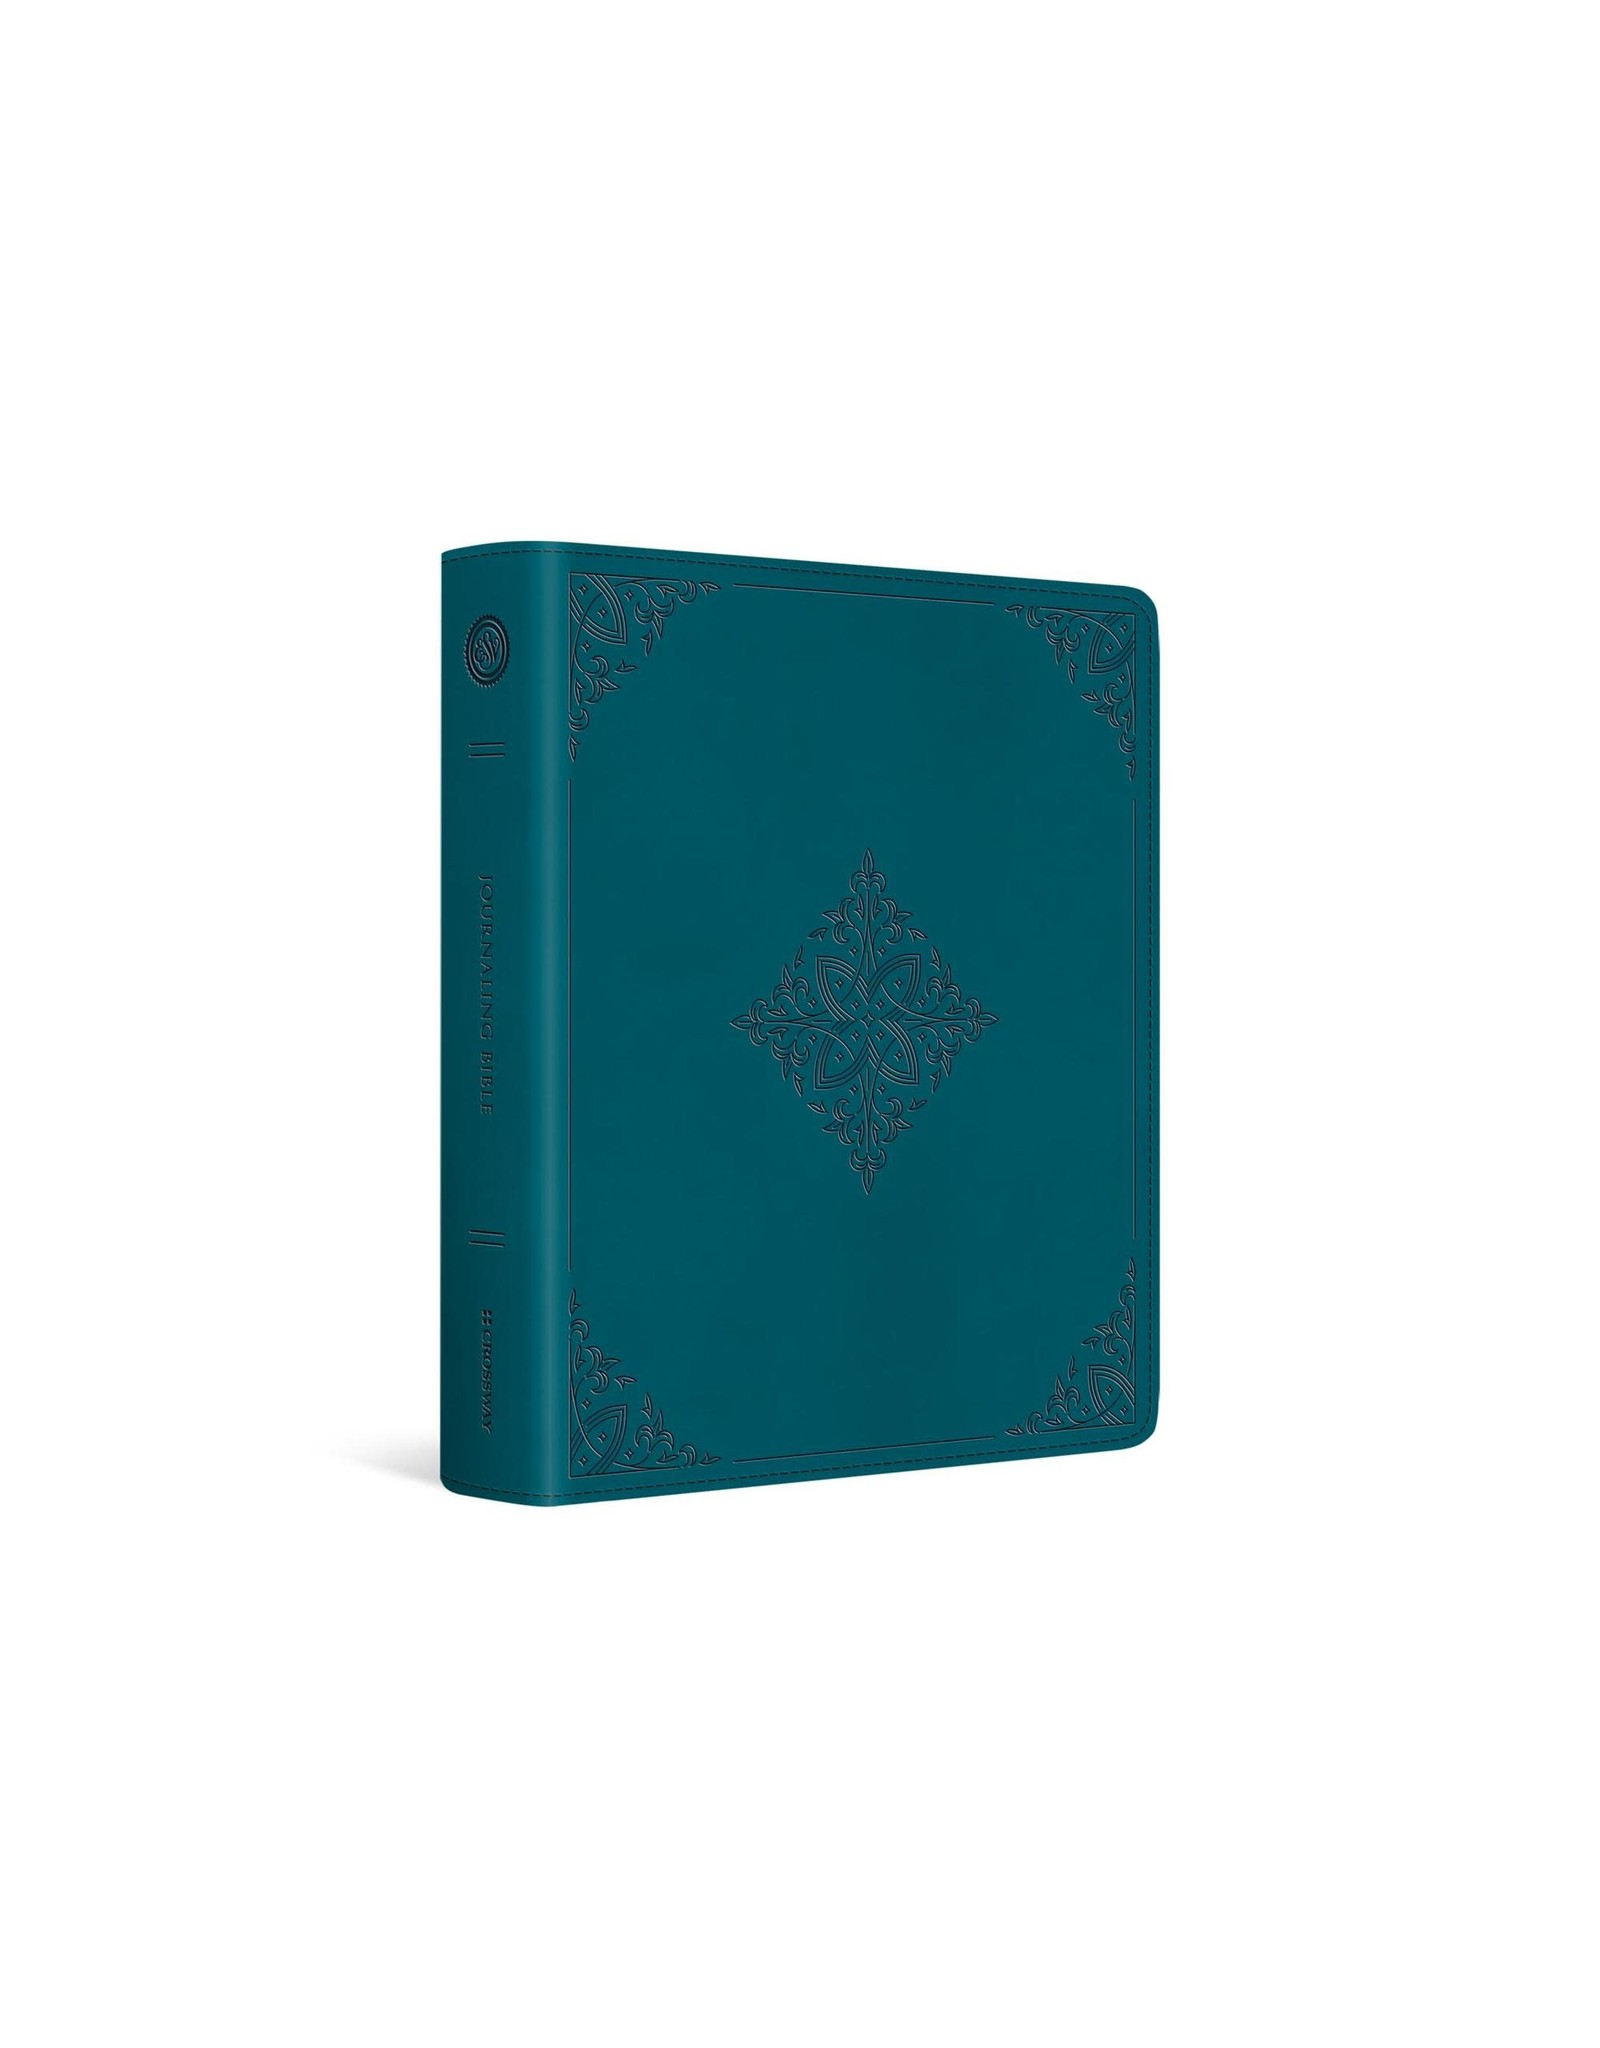 ESV Journaling Bible - Trutone Deep Teal